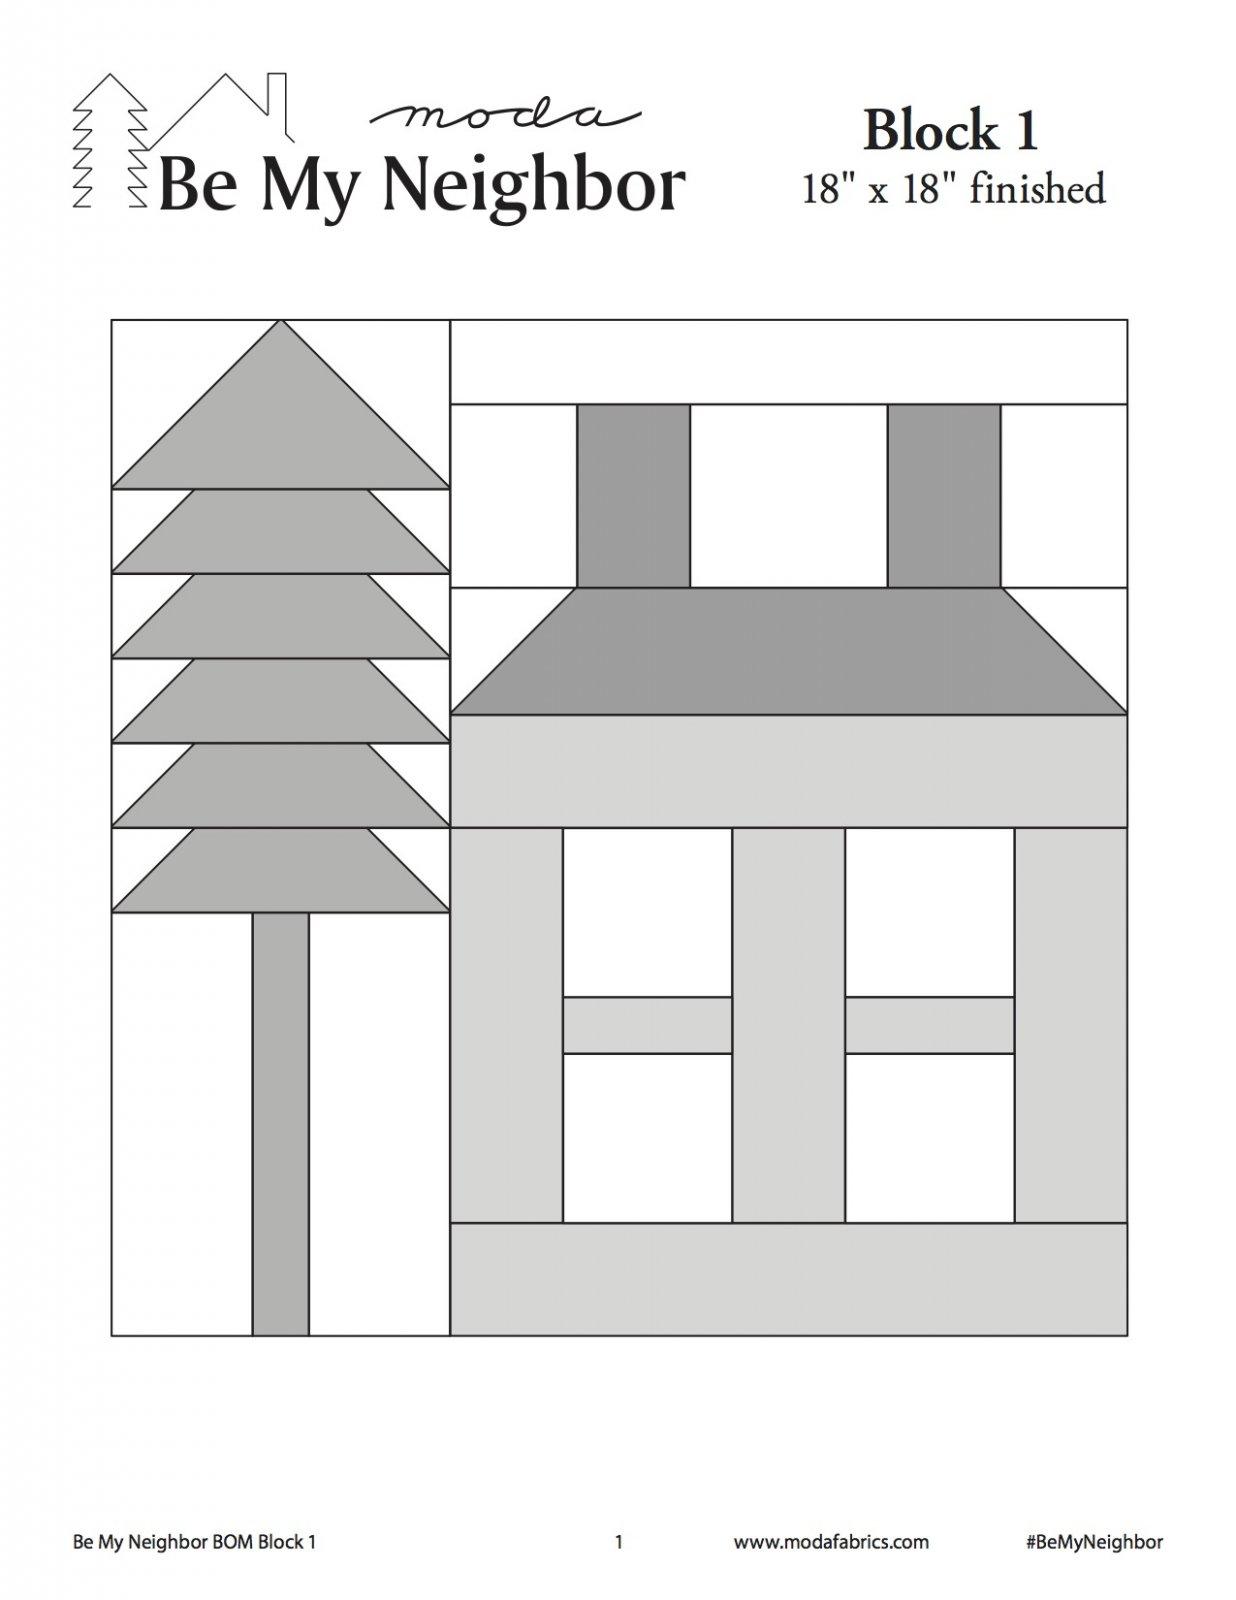 Be My Neighbor Quilt Along Block 1